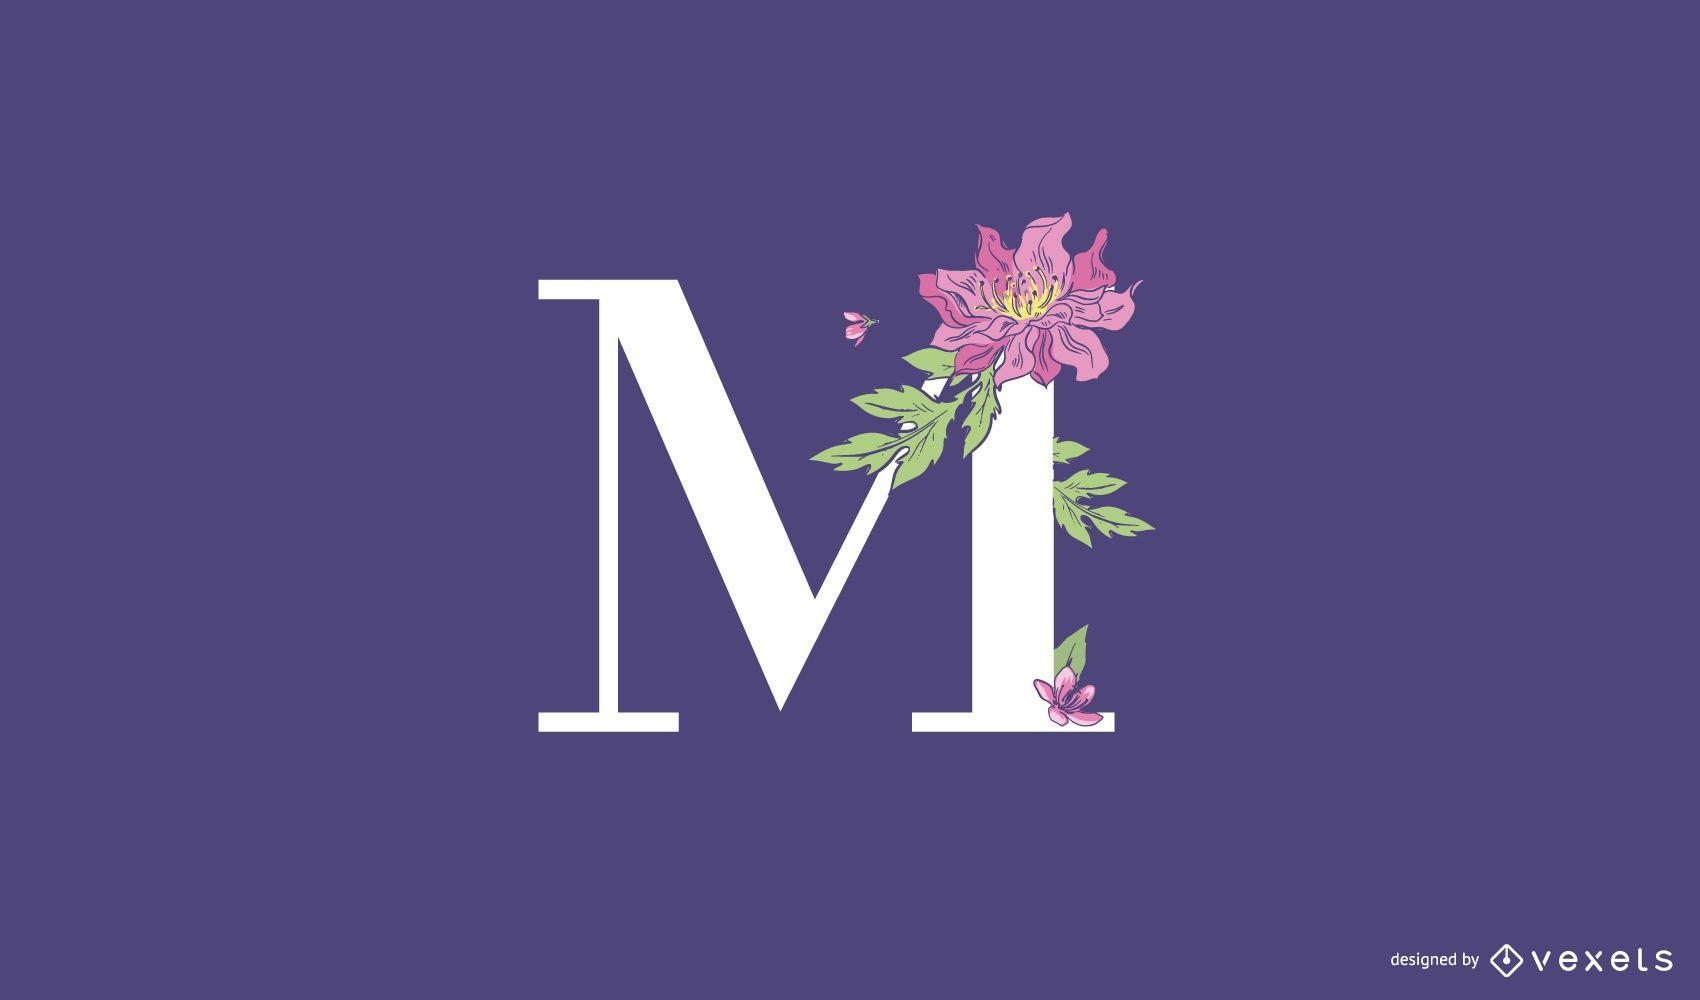 Modelo de logotipo floral com letra M